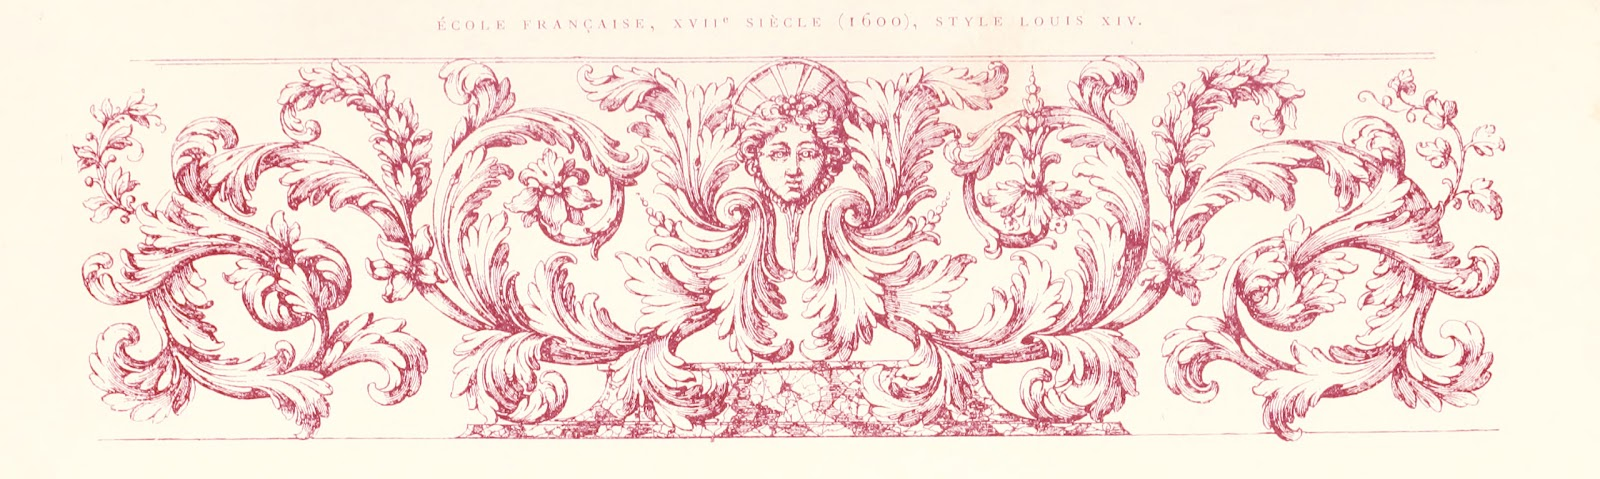 Vintage Ephemera Engraving French Decorative Floral